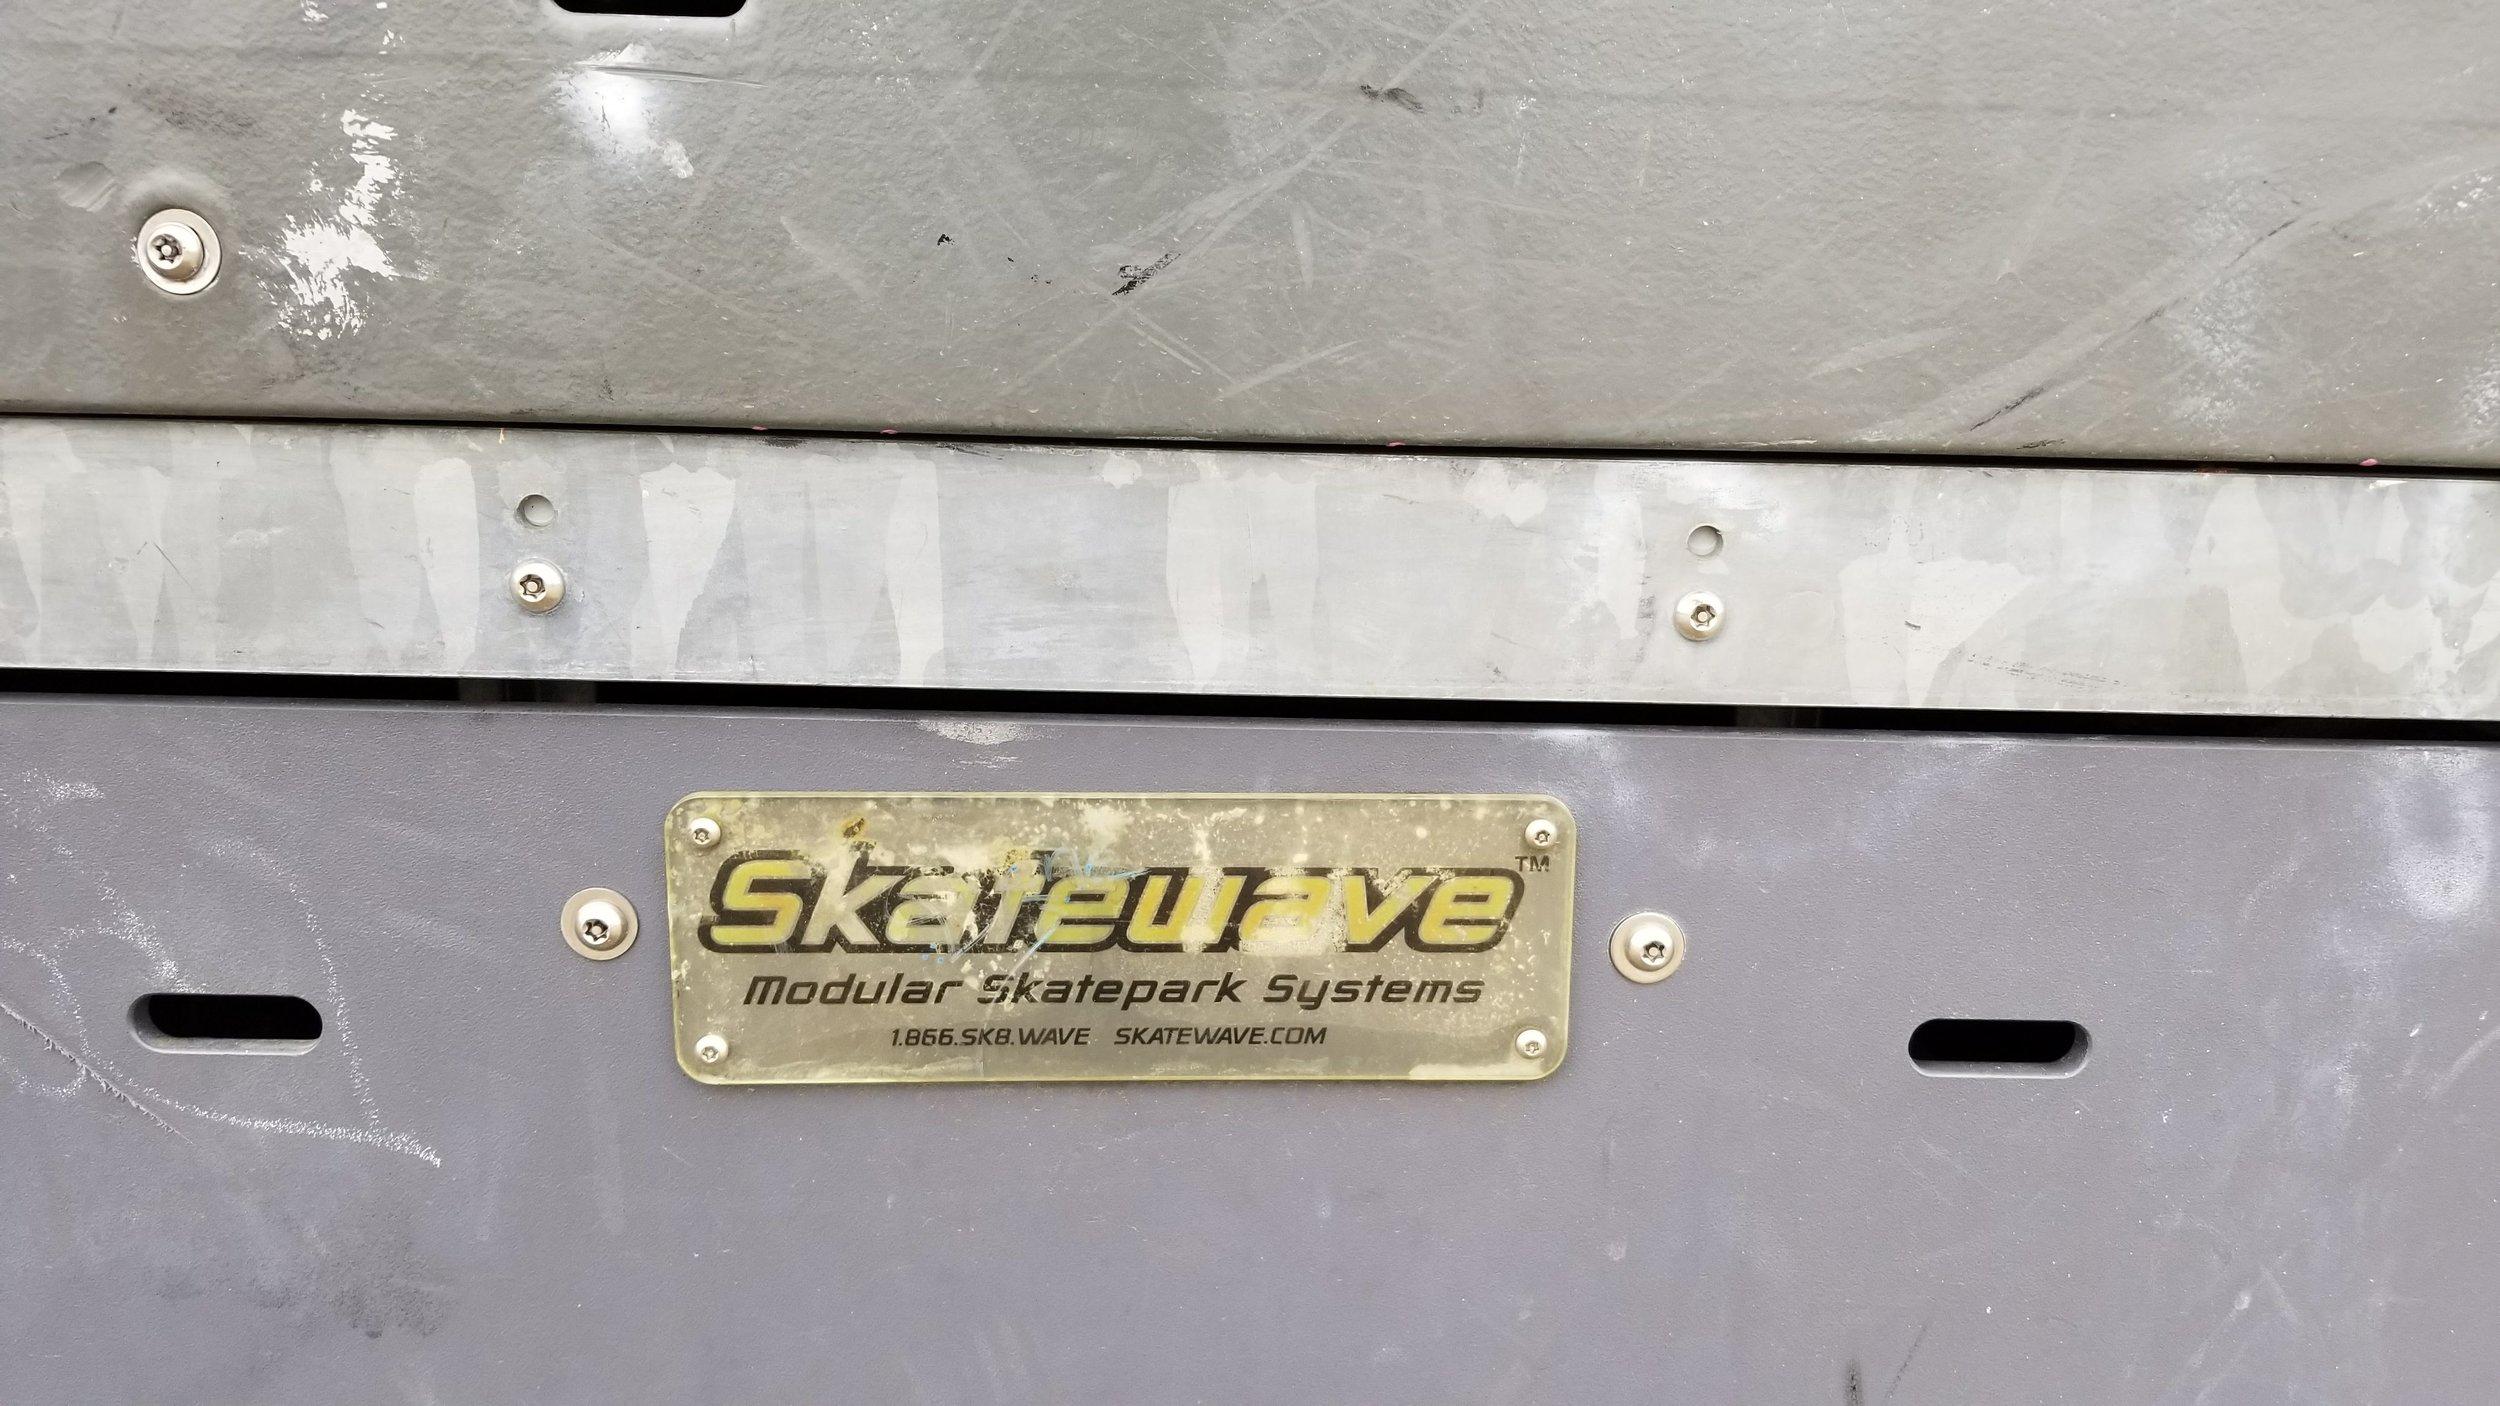 Skatewave Modular Ramps